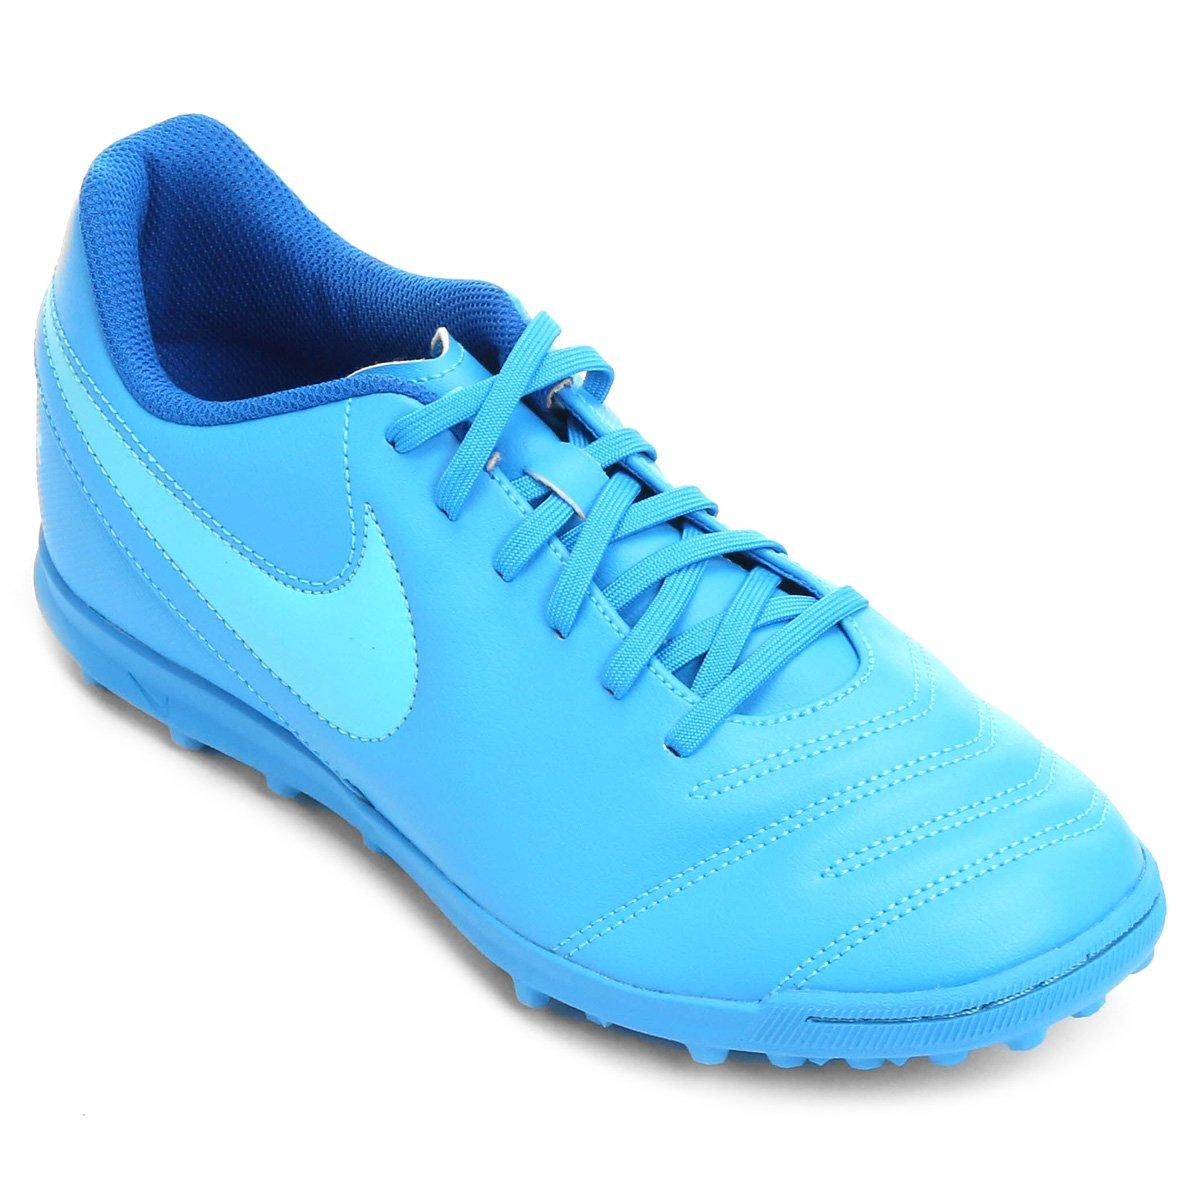 d75e74a7fd Chuteira Society Nike Tiempo Rio 3 TF Masculina